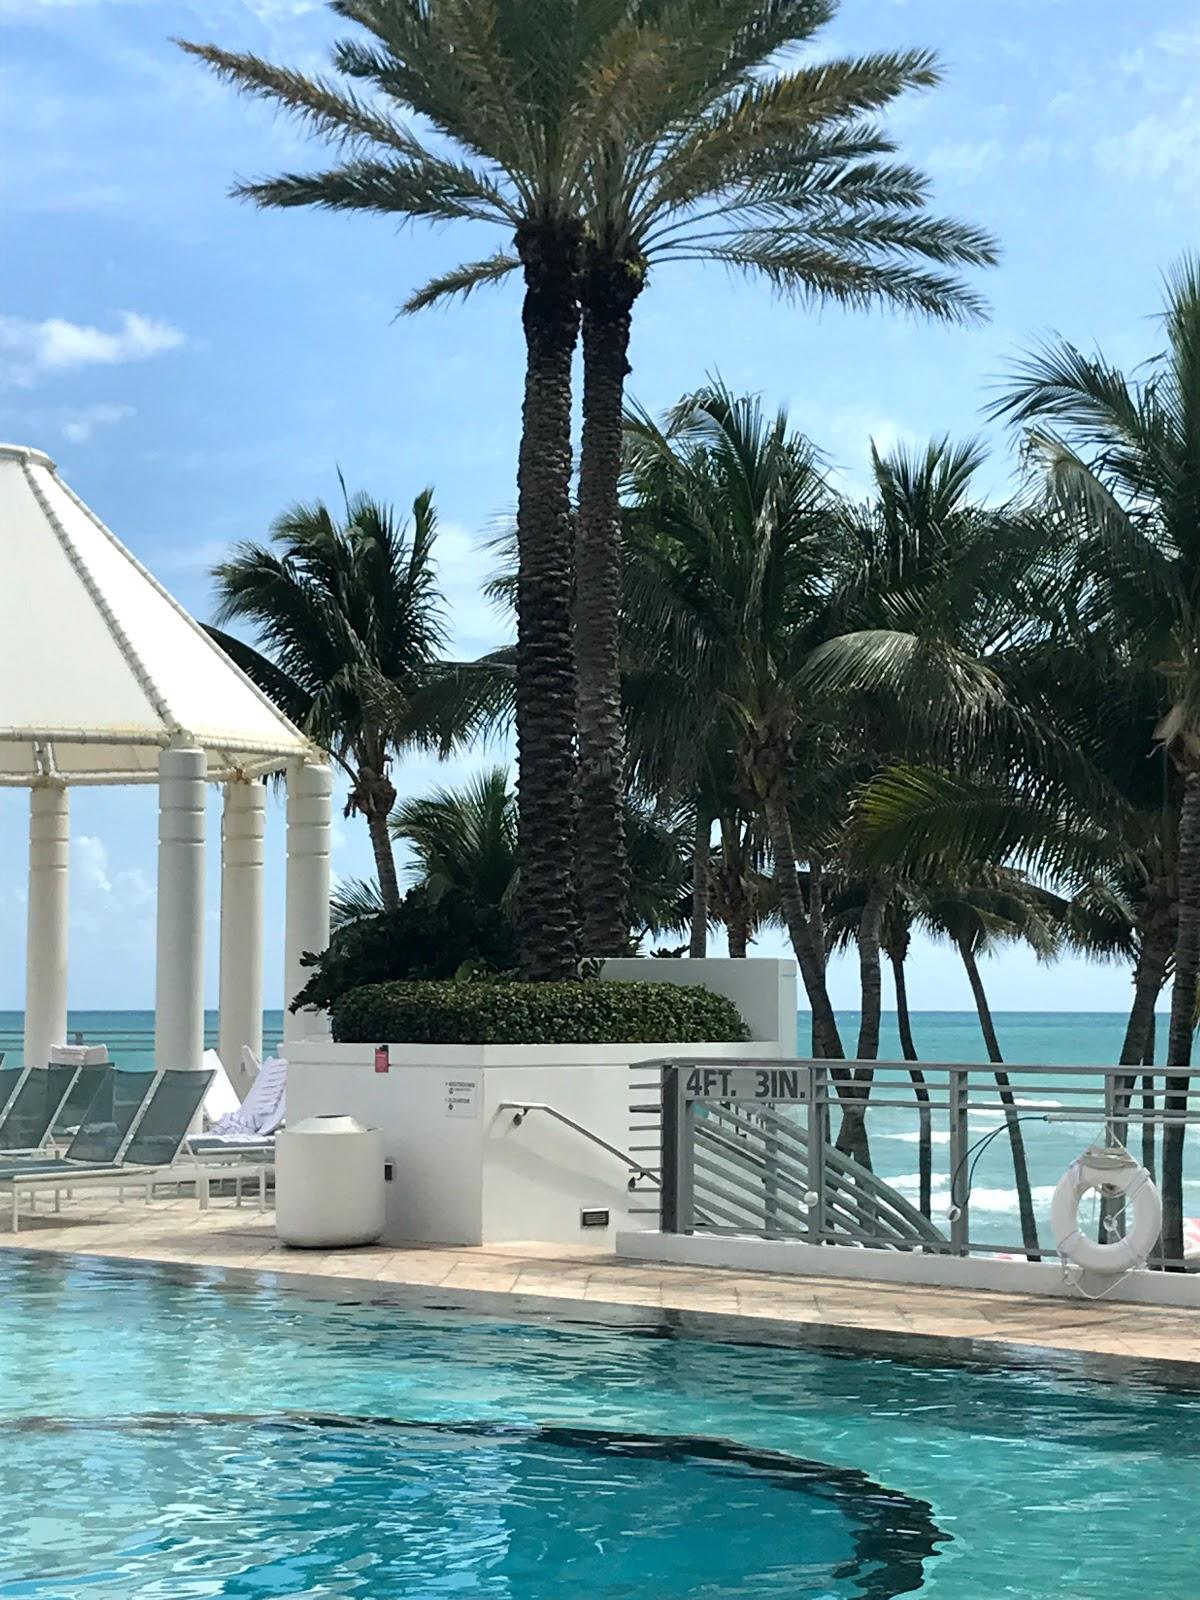 Diplomat hotel in Hollywood Florida, diplomat pool in Hollywood Florida